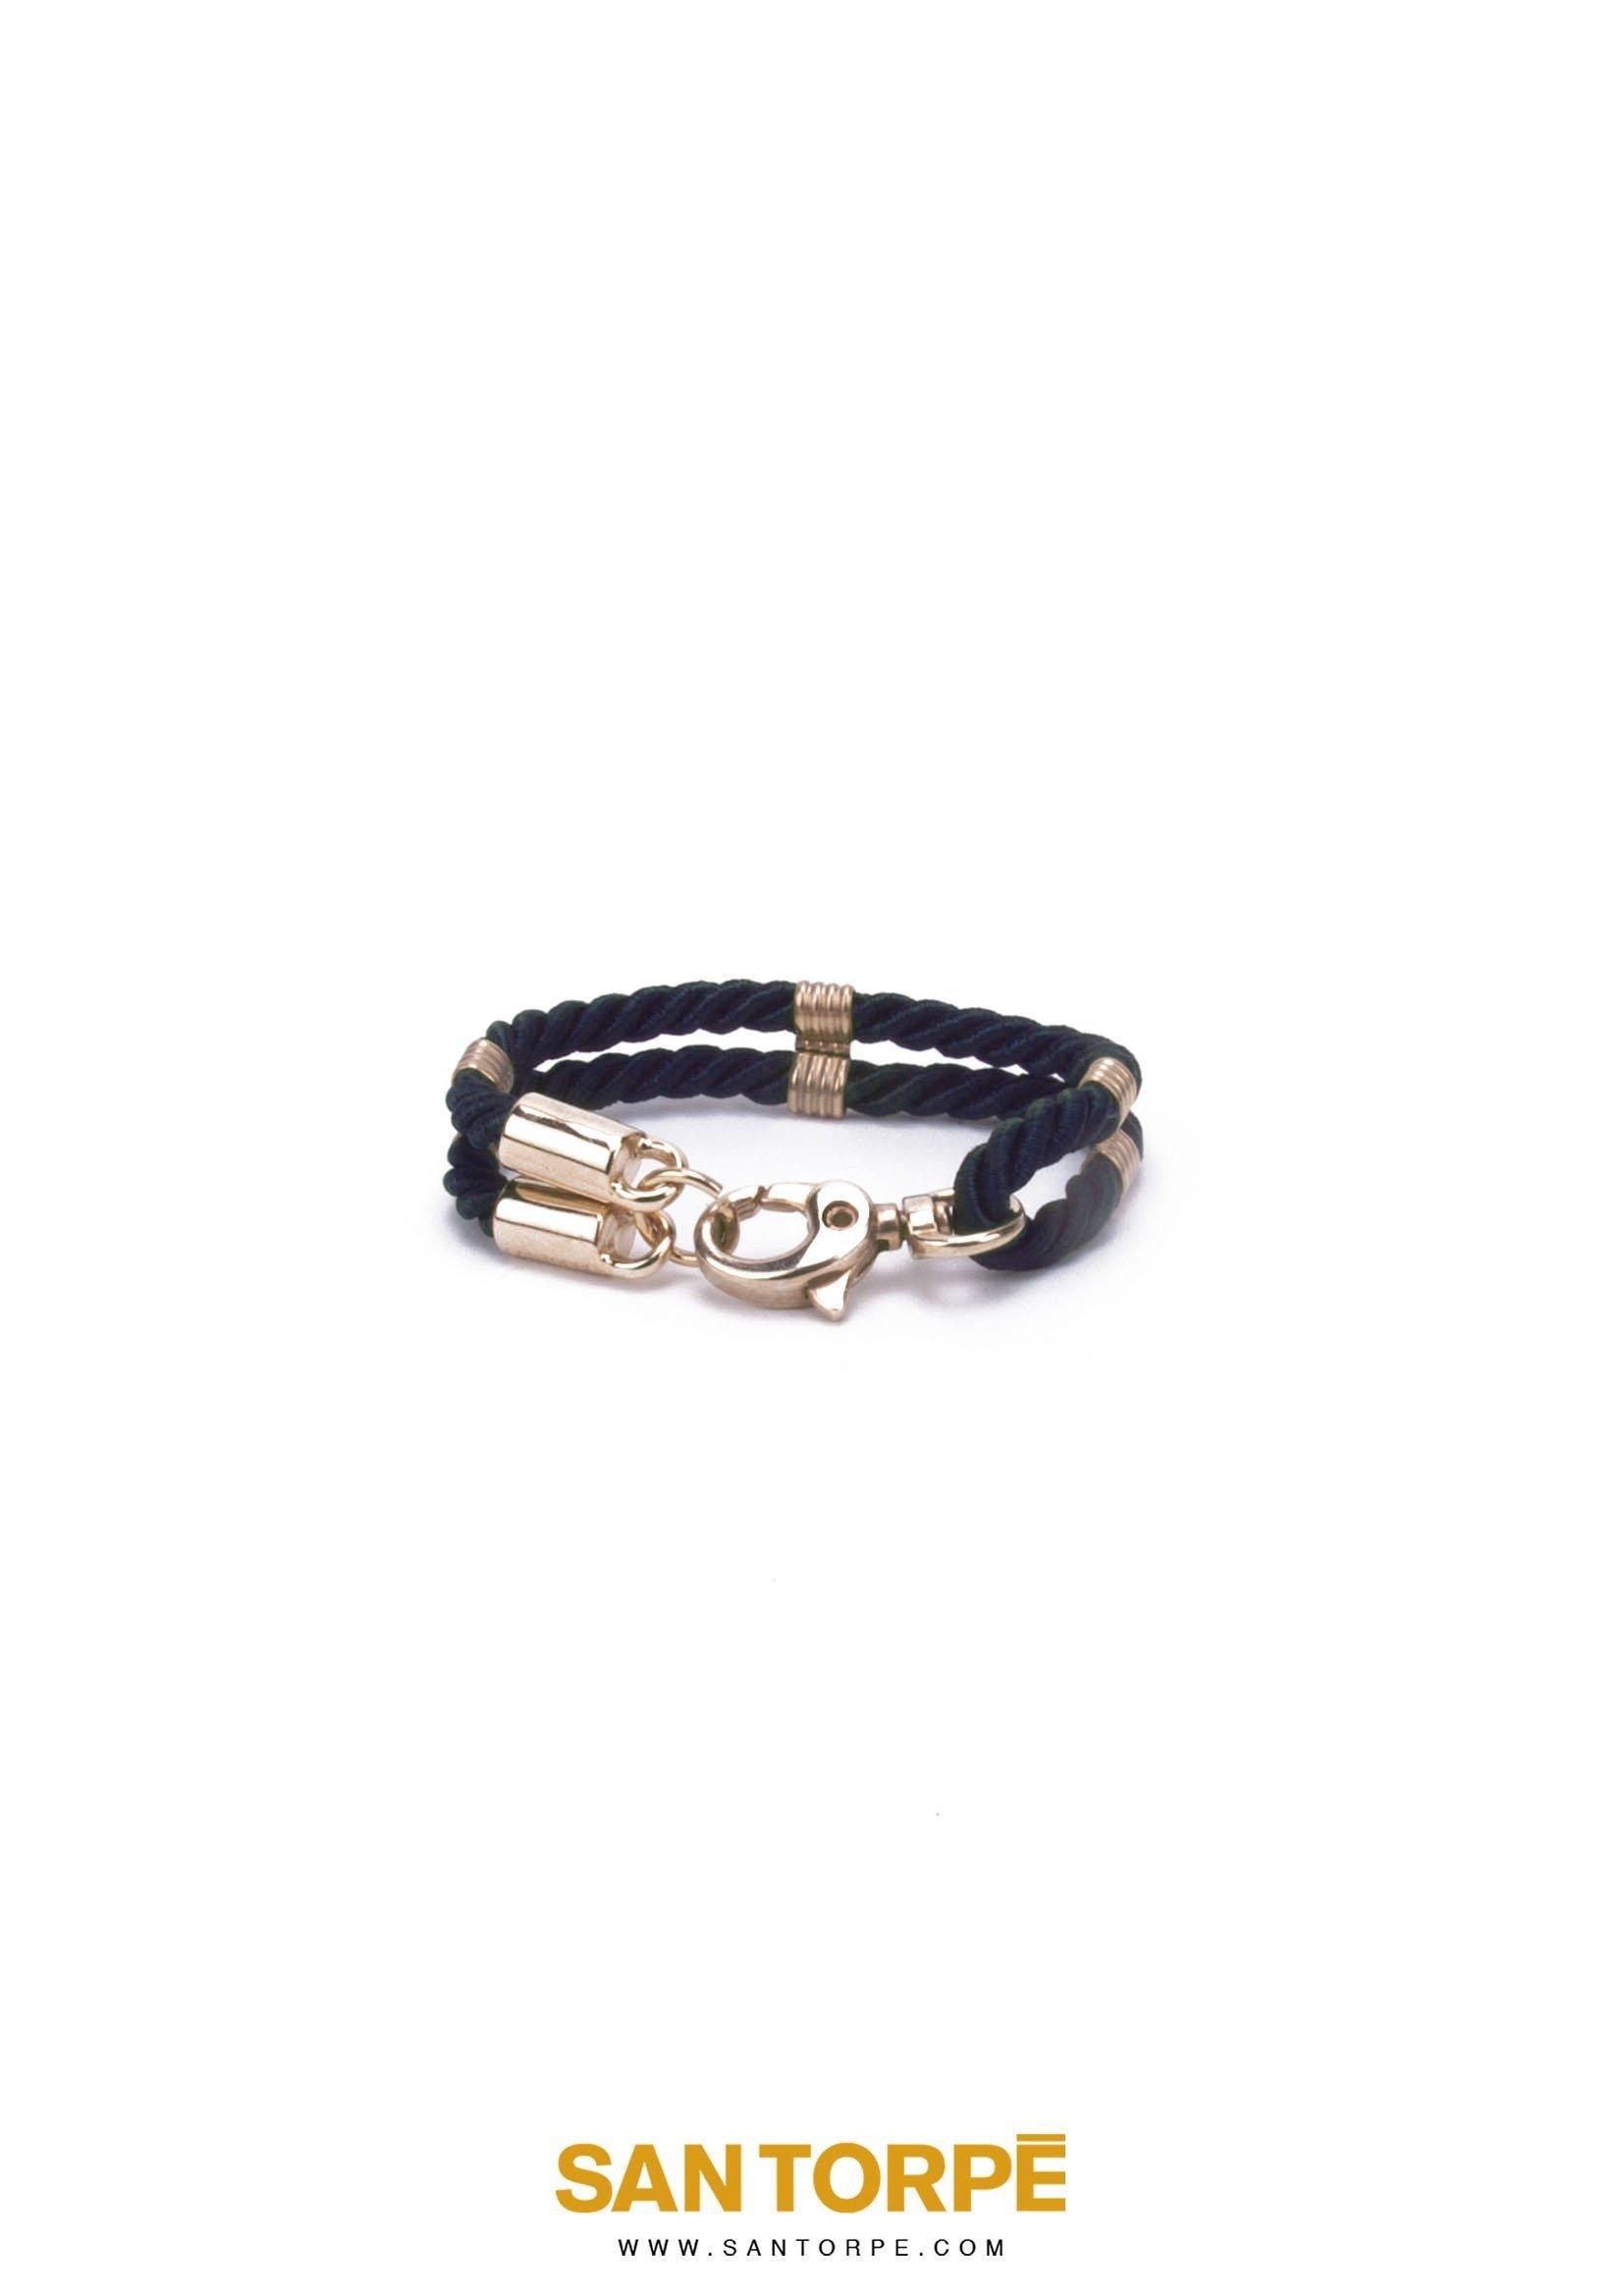 Sapphire Navy Bracelet San Torpe Jet Set Lifestyle